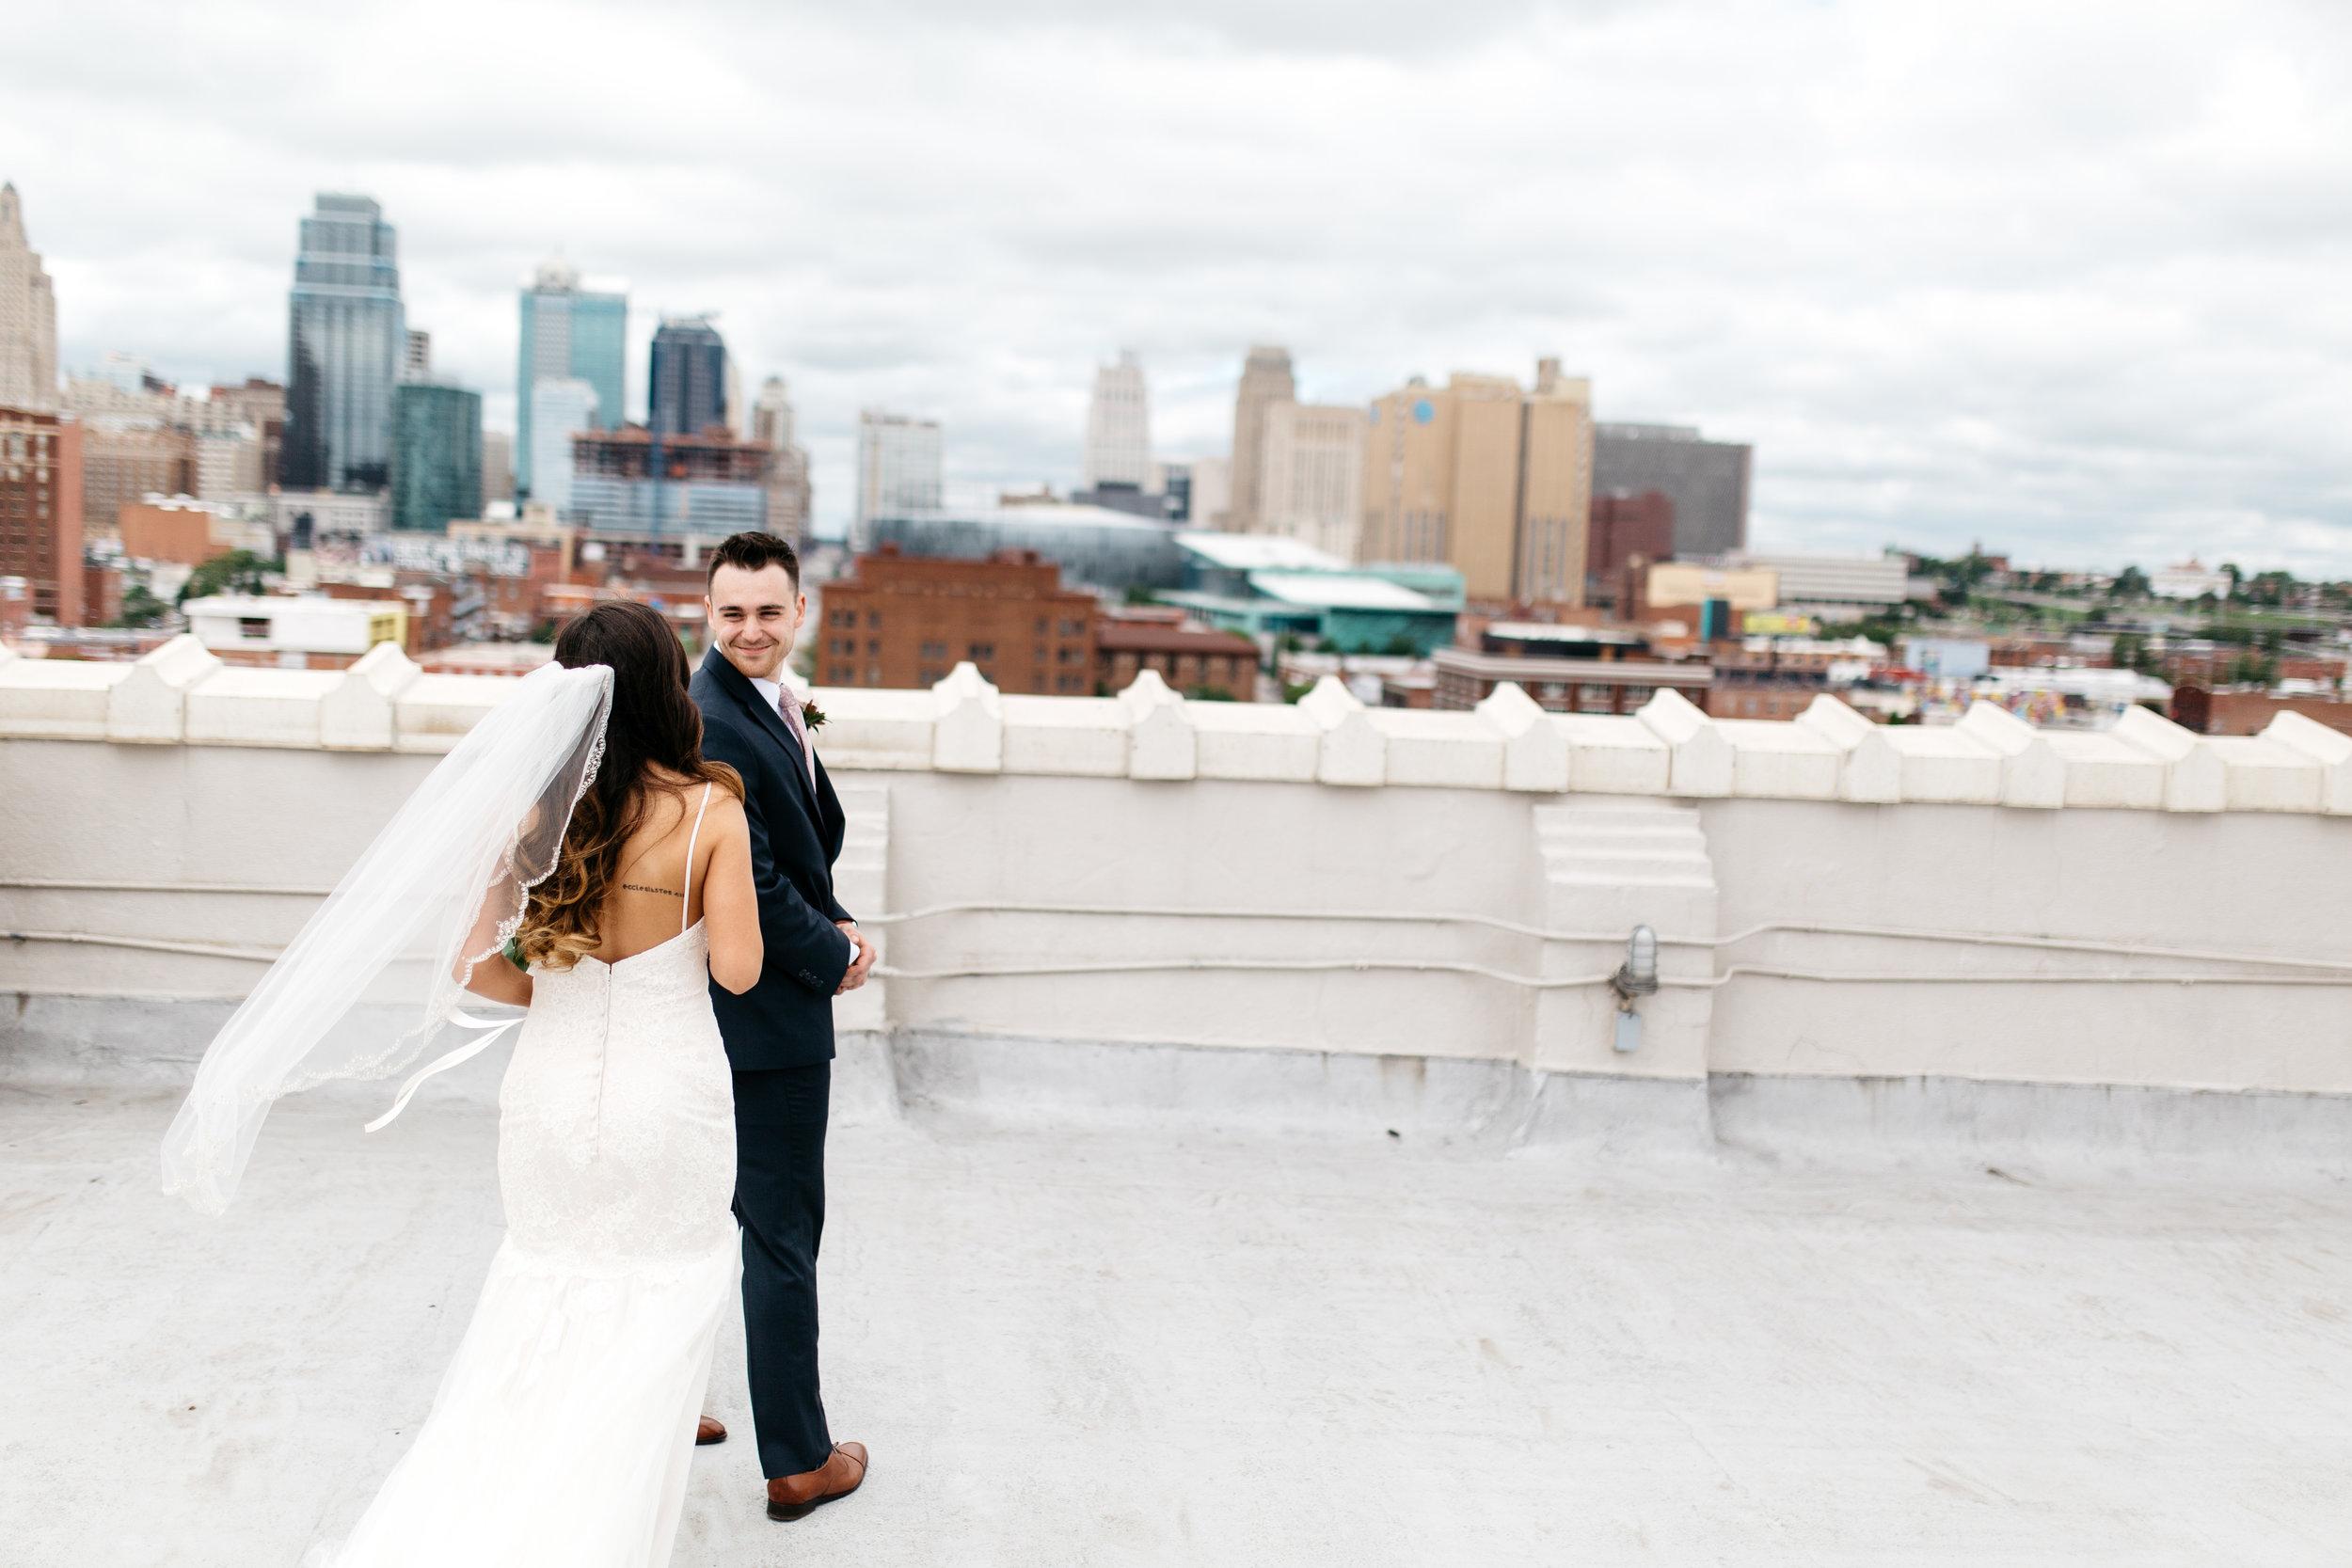 weddingblogmannring-66.jpg